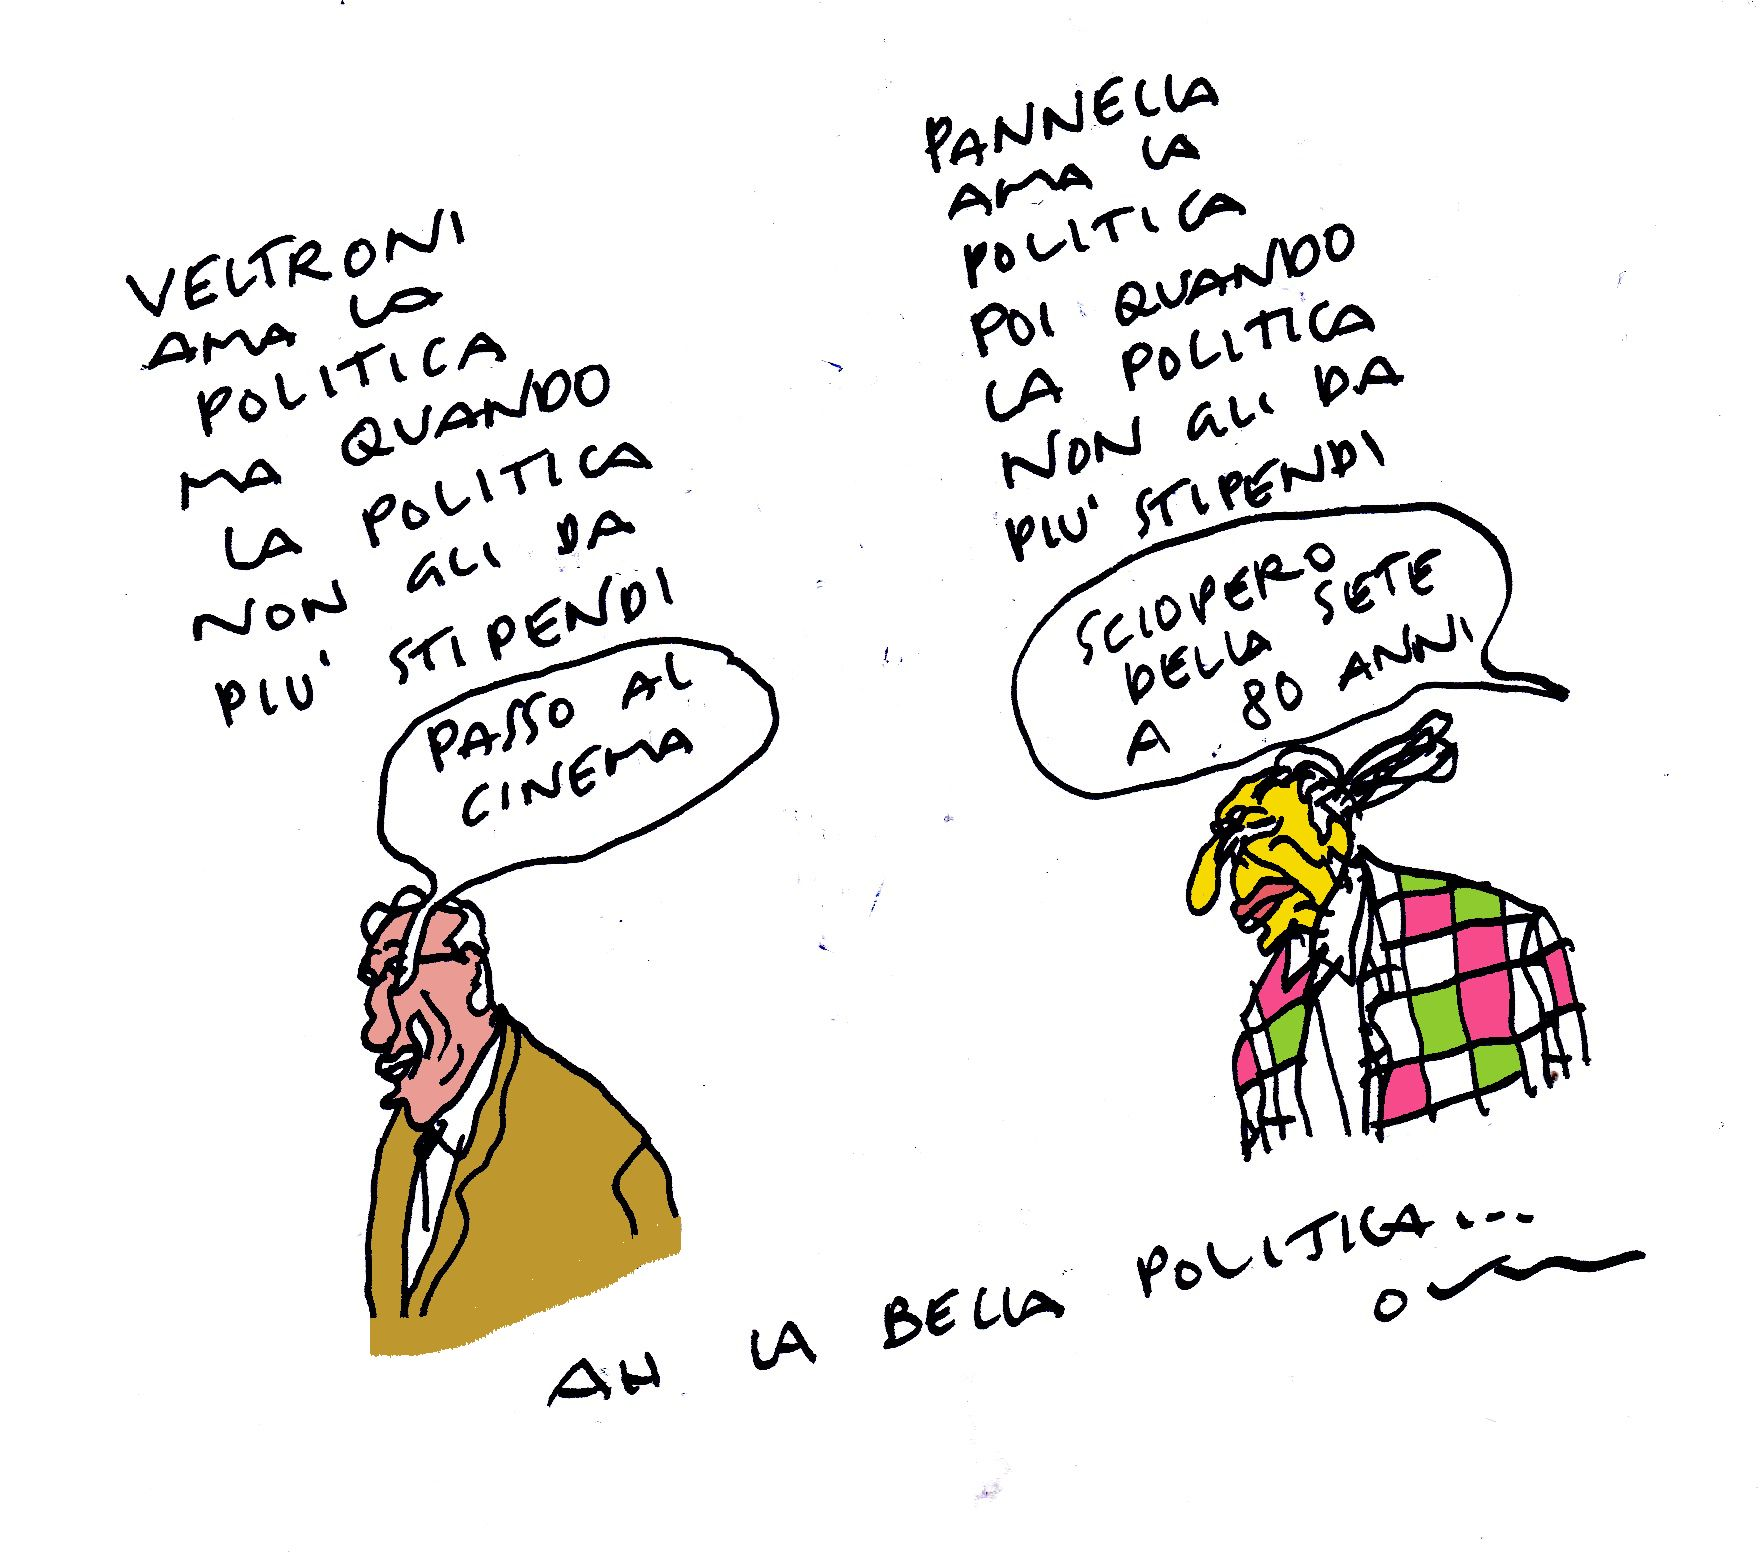 amantik della politica